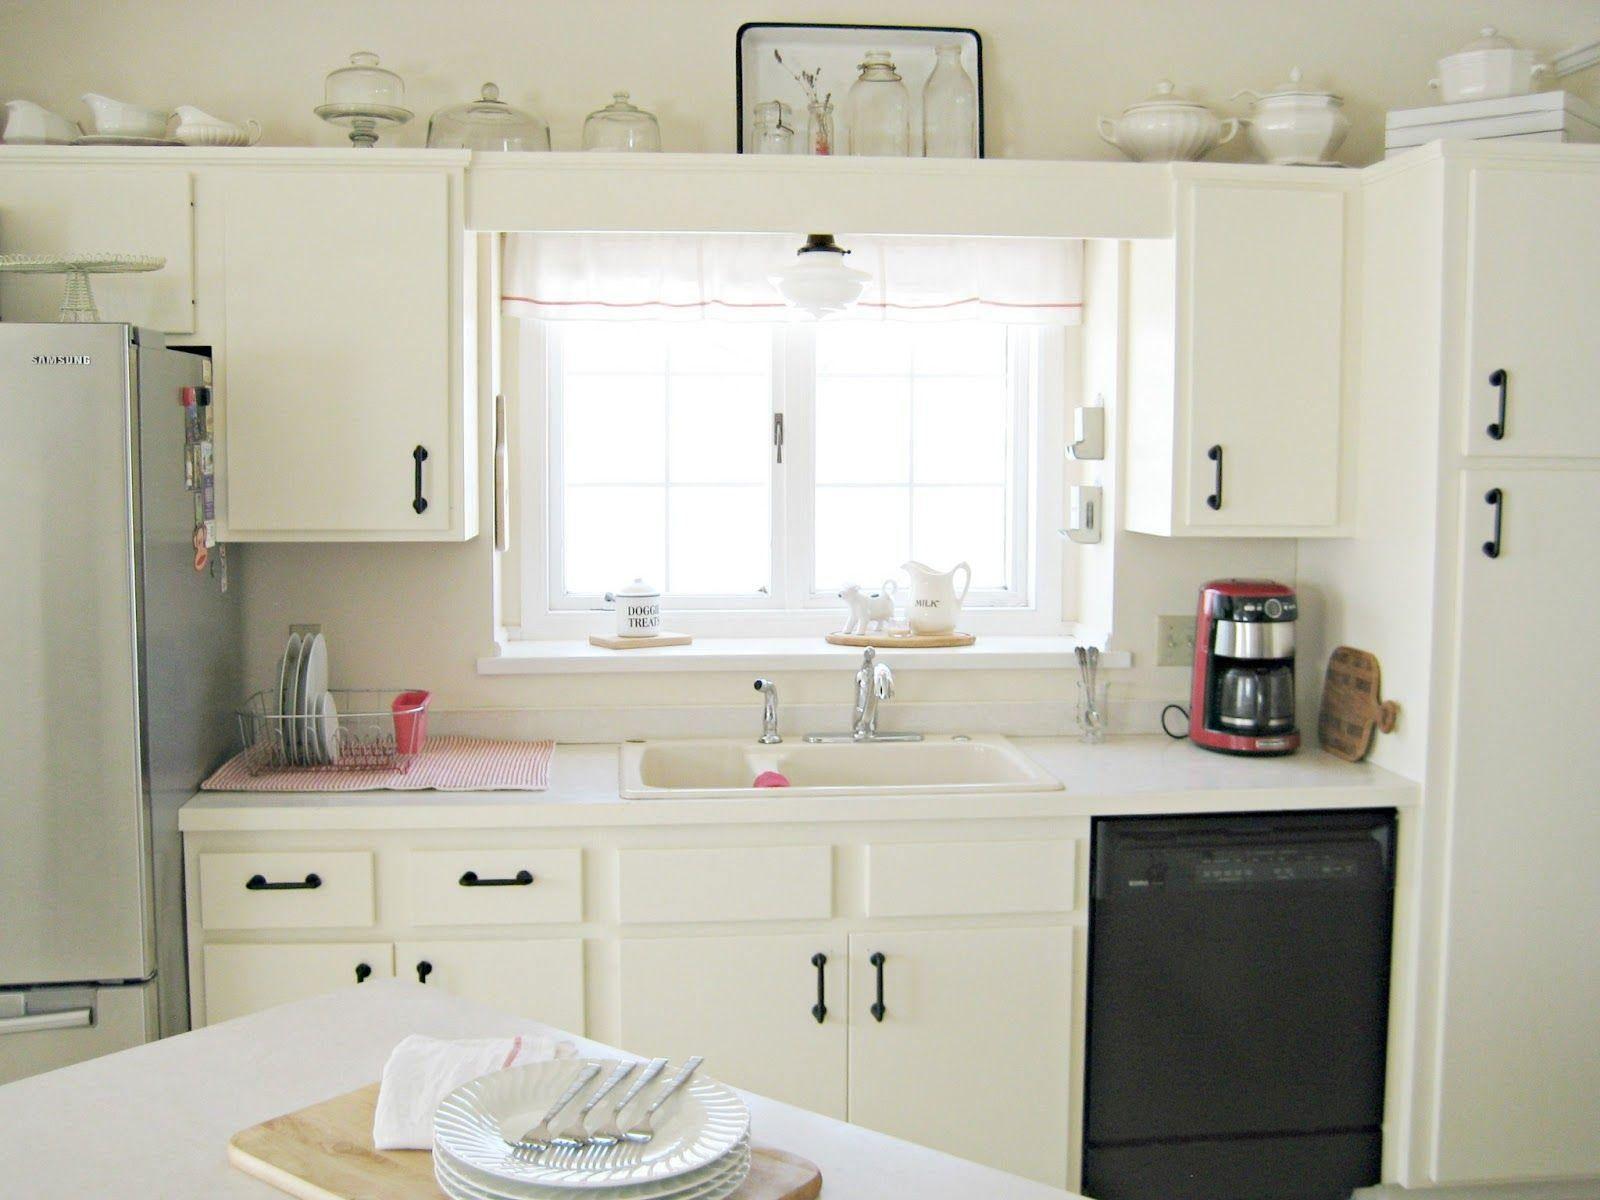 Pendant Lights Commonplace Kitchen Lighting Above Sink Light Over Urn Satin Brass Mid Ce Kitchen Curtain Designs Vintage Kitchen Cabinets Kitchen Sink Lighting